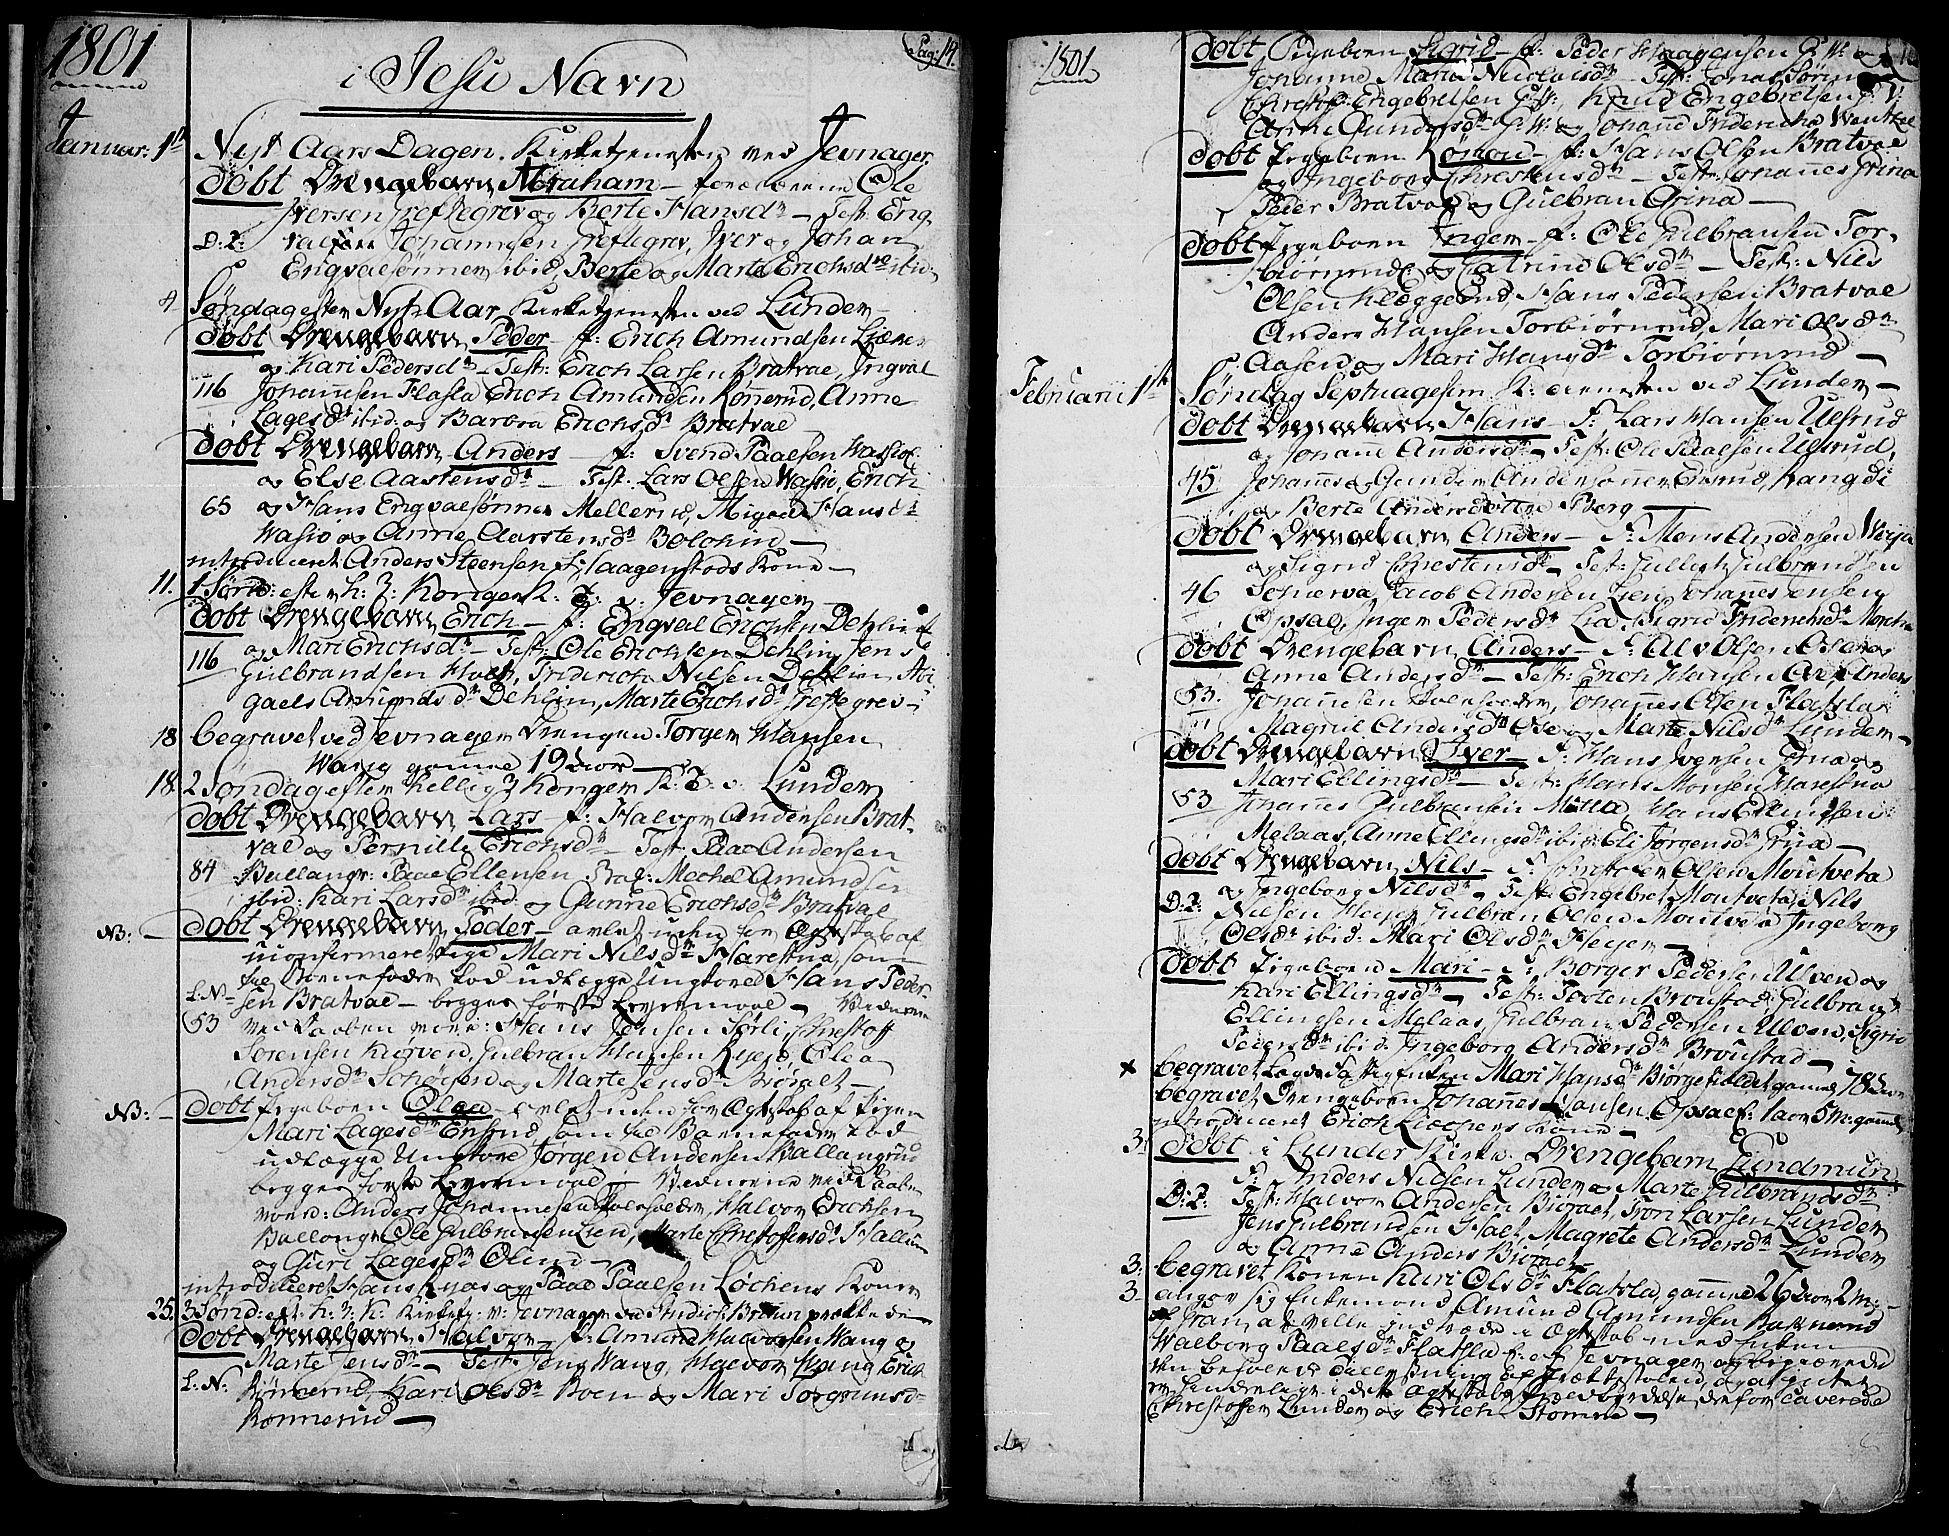 SAH, Jevnaker prestekontor, Ministerialbok nr. 4, 1800-1861, s. 14-15